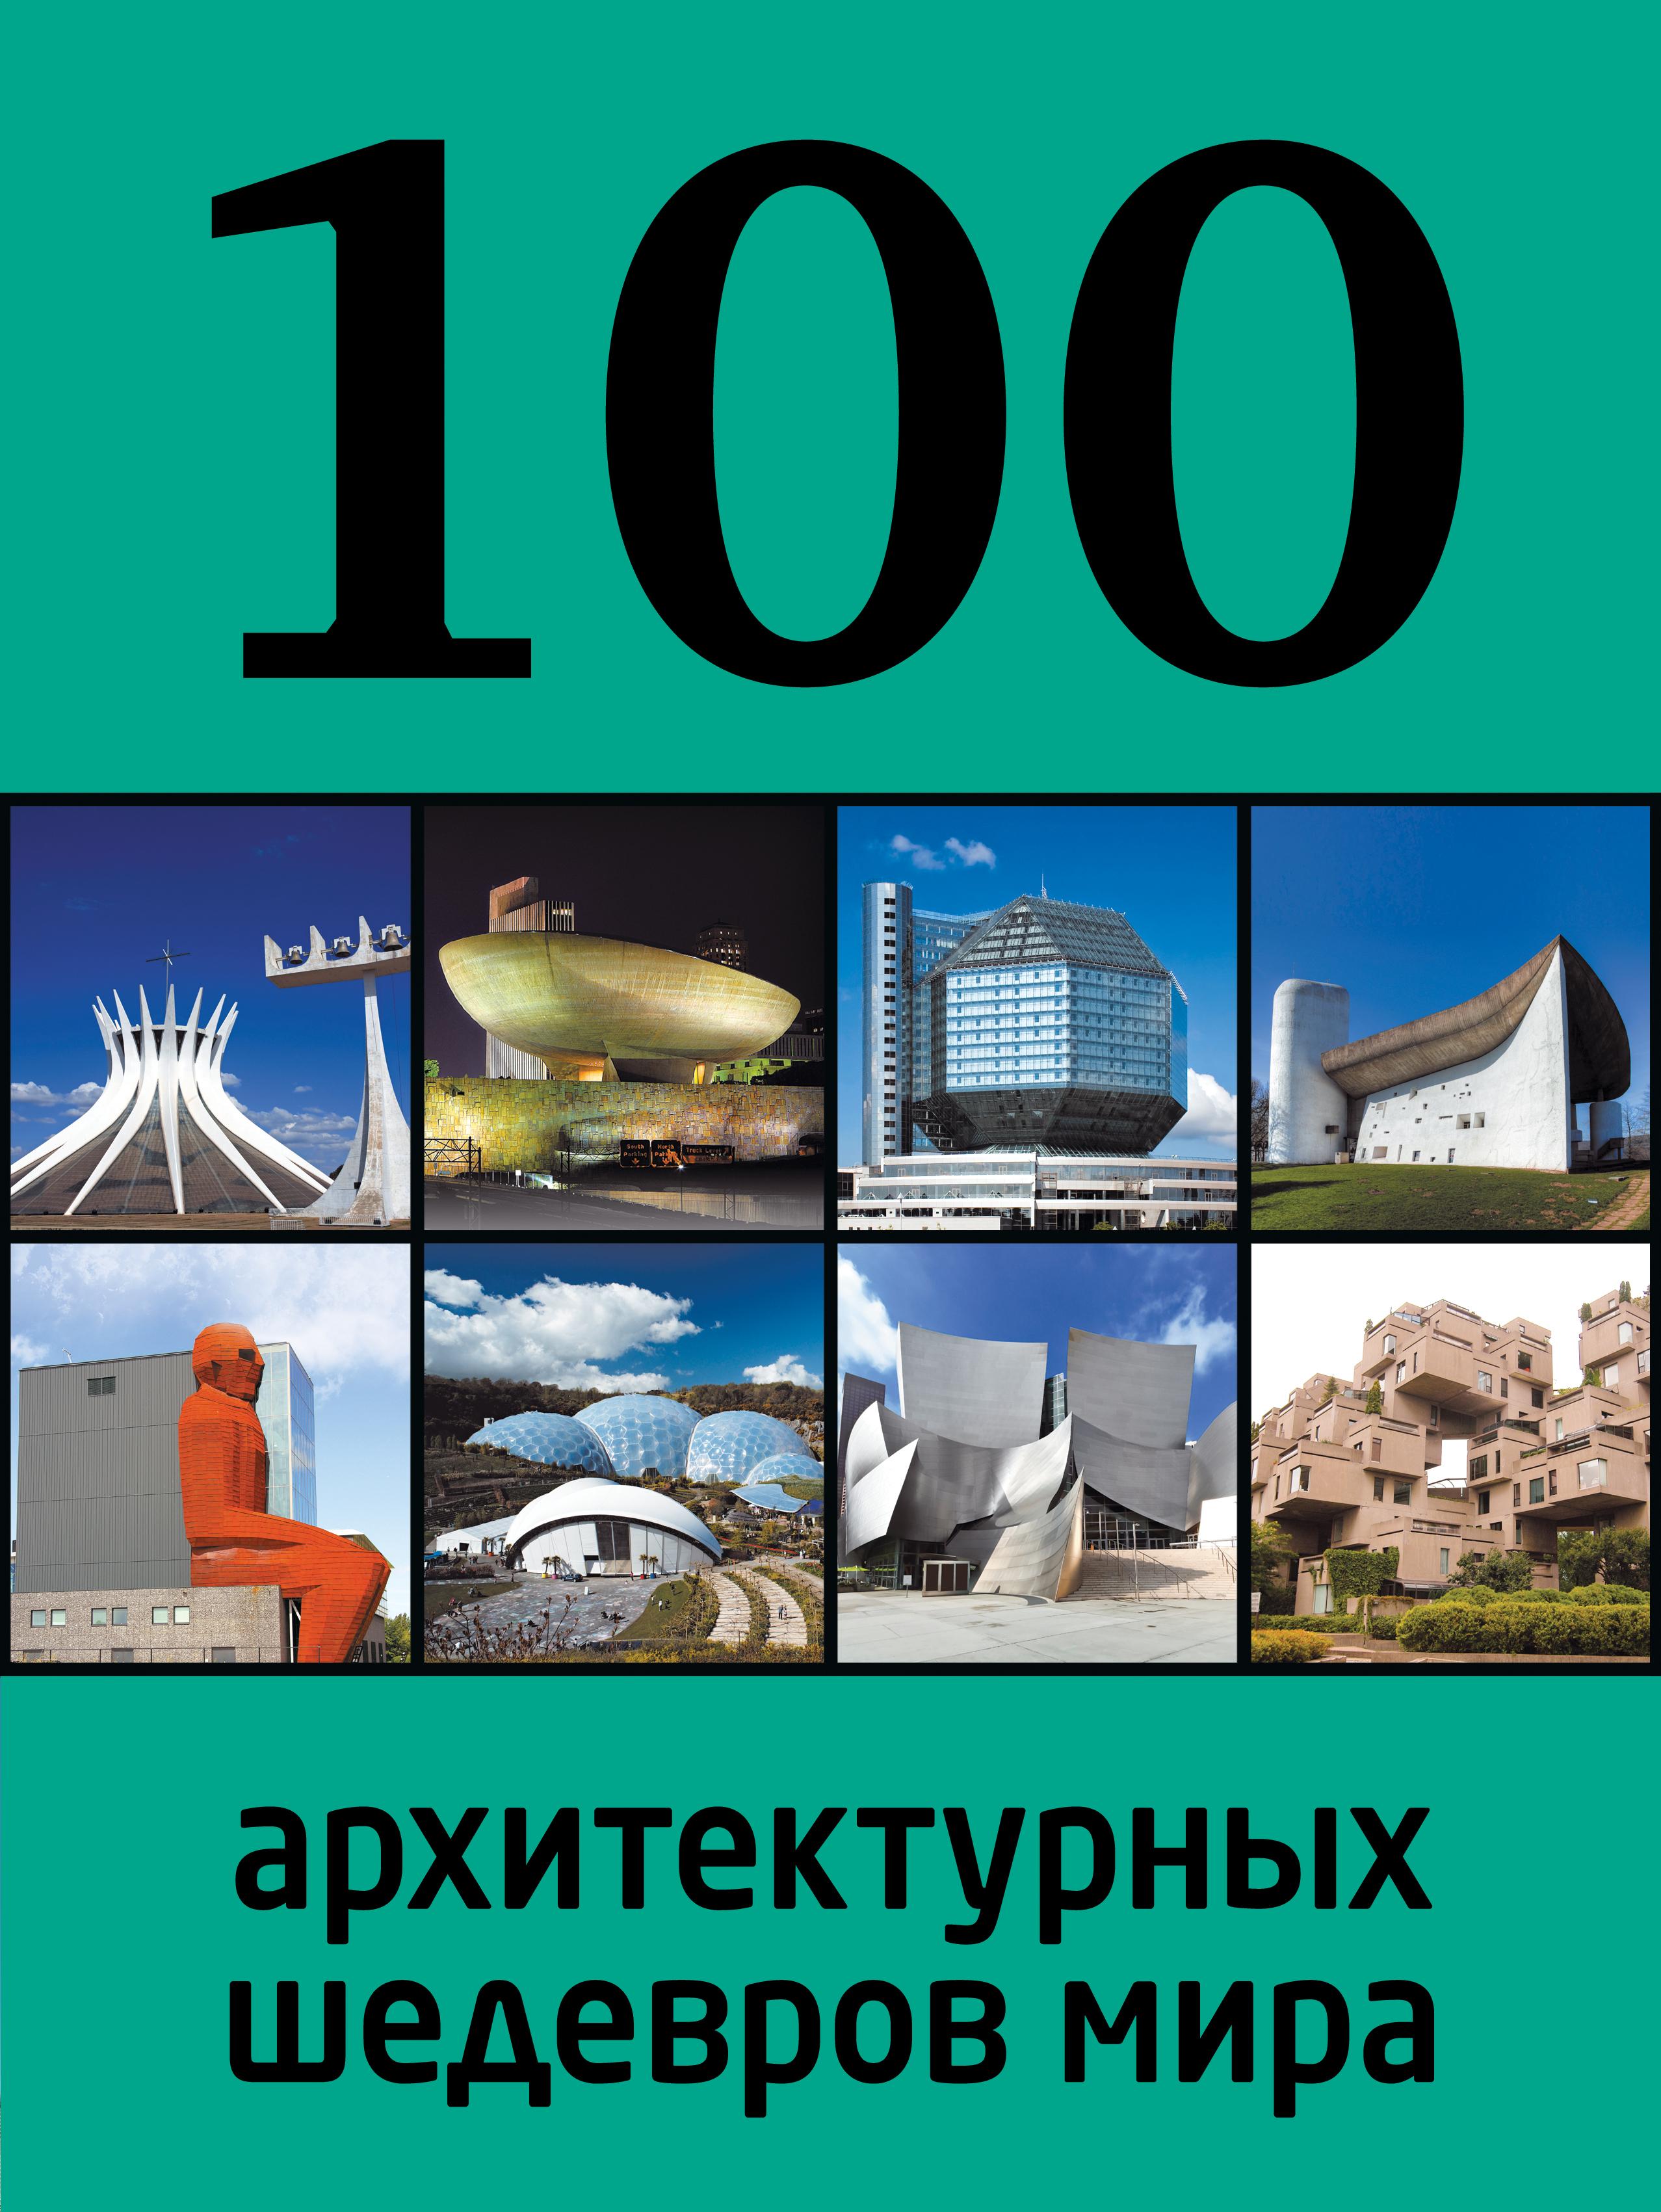 100 ������������� �������� ����